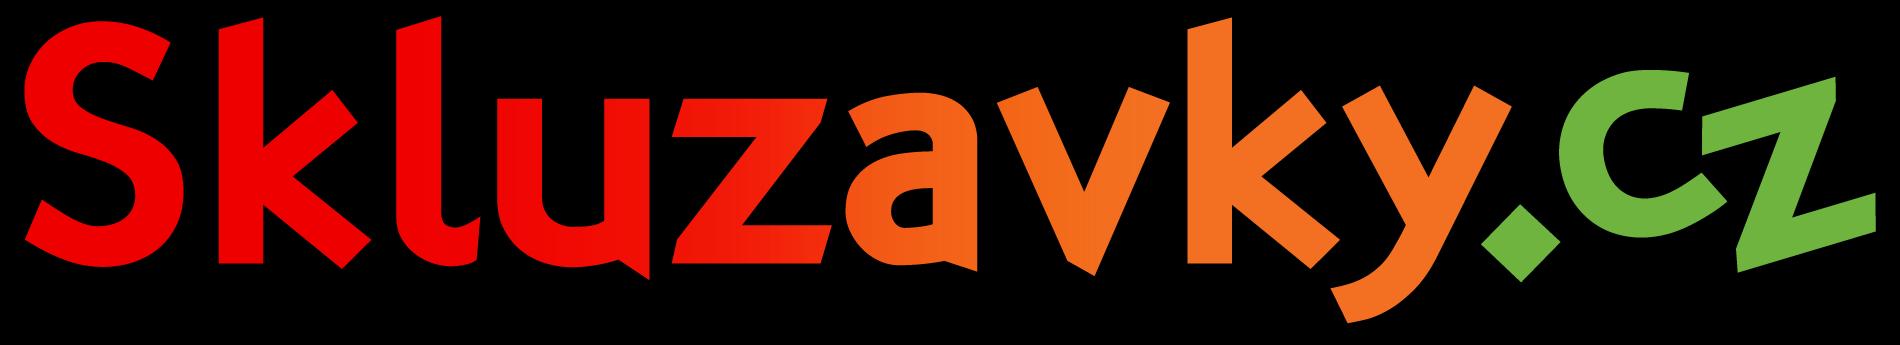 skluzavky-main-logo-1900x345